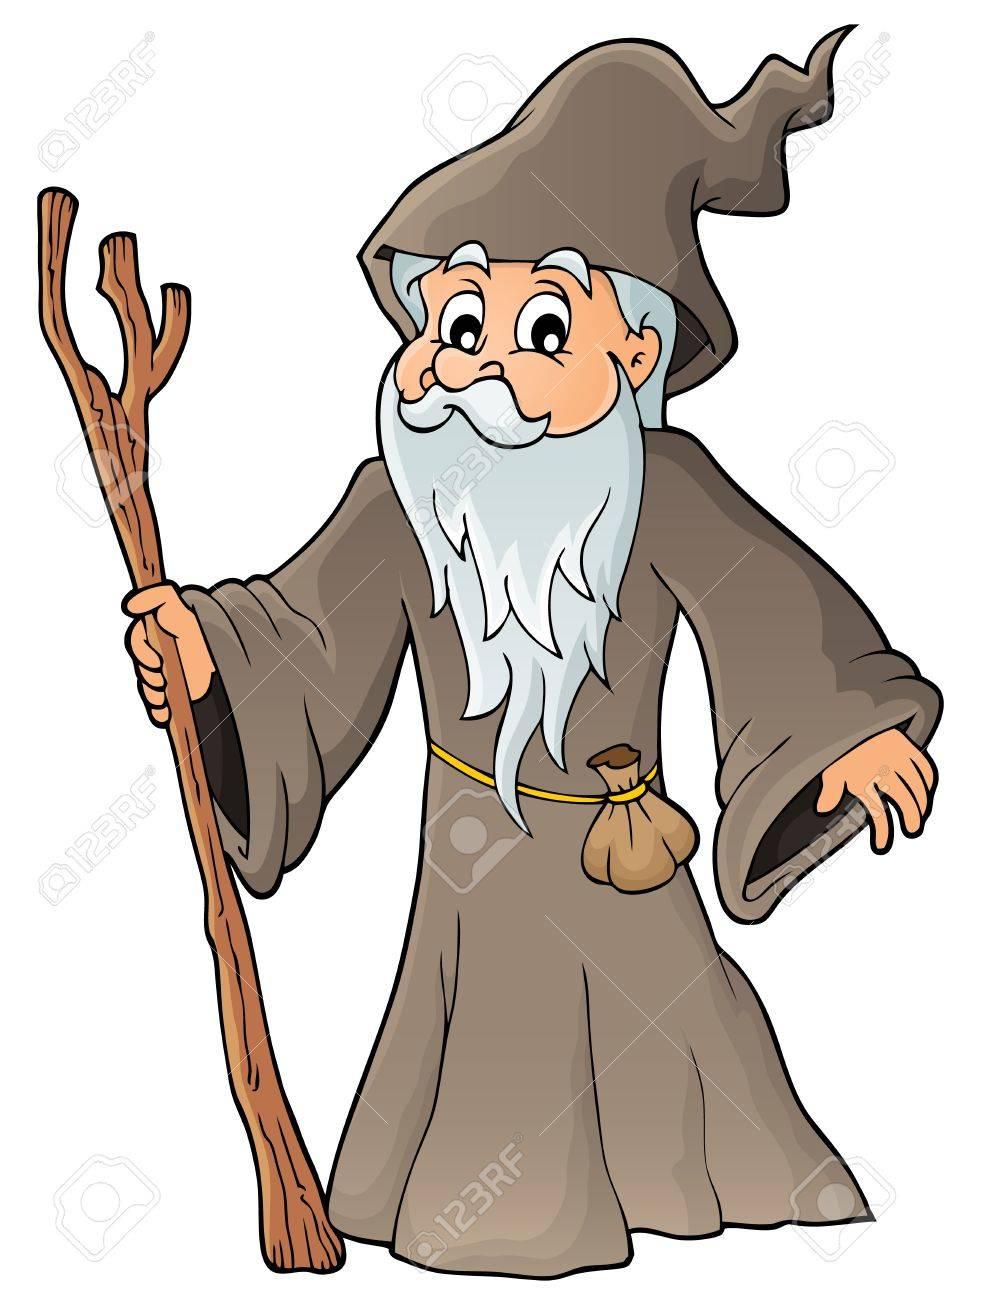 Druid theme image Stock Vector - 31384531